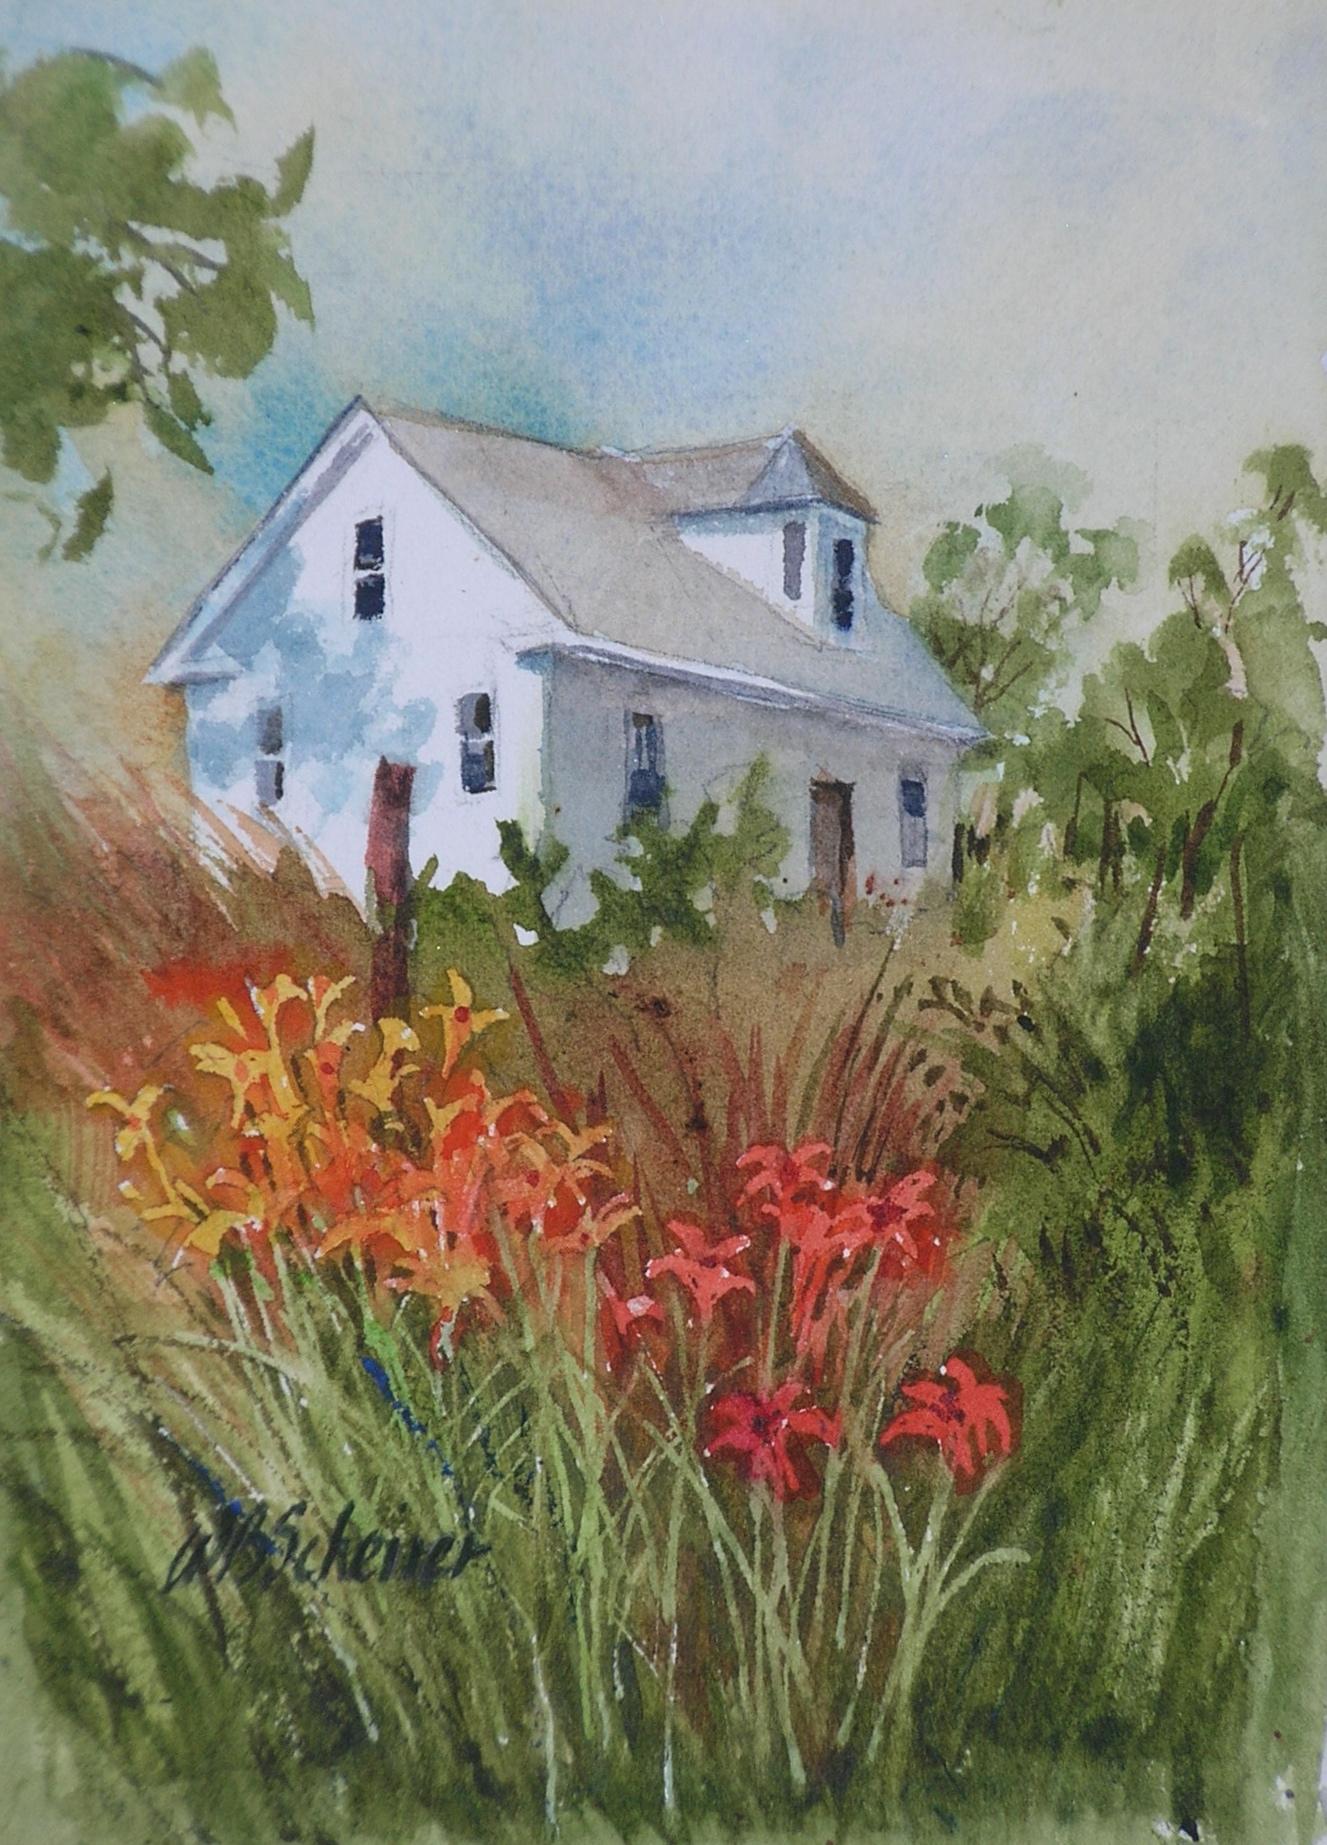 Wendy S Watercolor